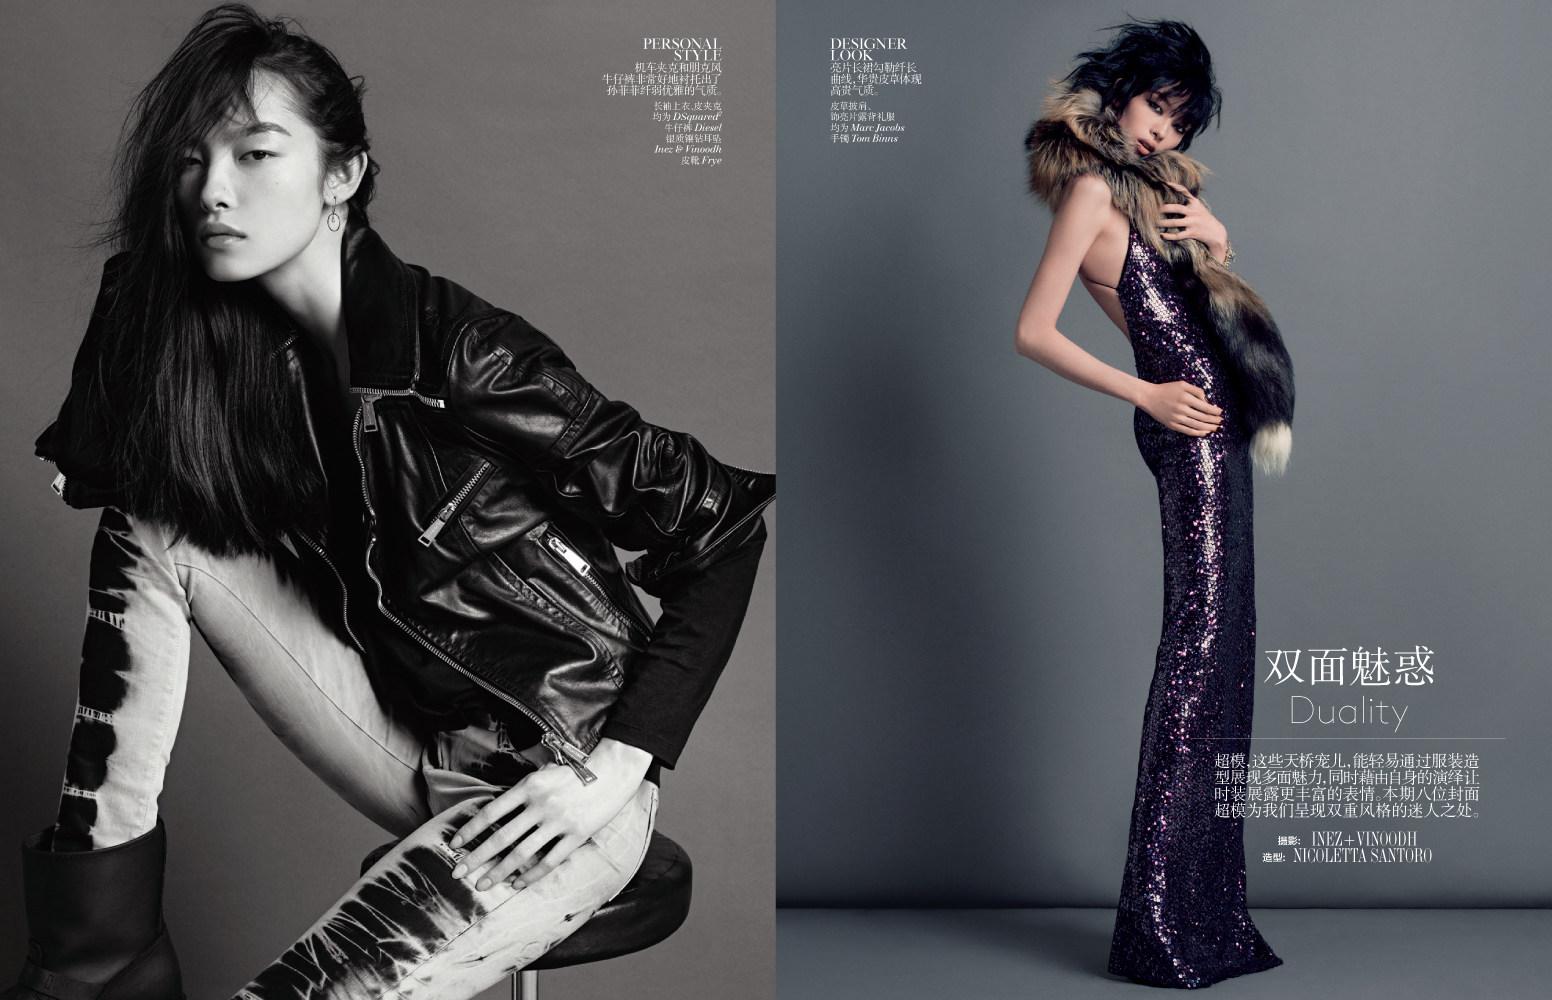 Sasha Pivovarova, Fei Fei Sun Anais Mali by Patrick Demarchelier for Vogue February 2014 best photo